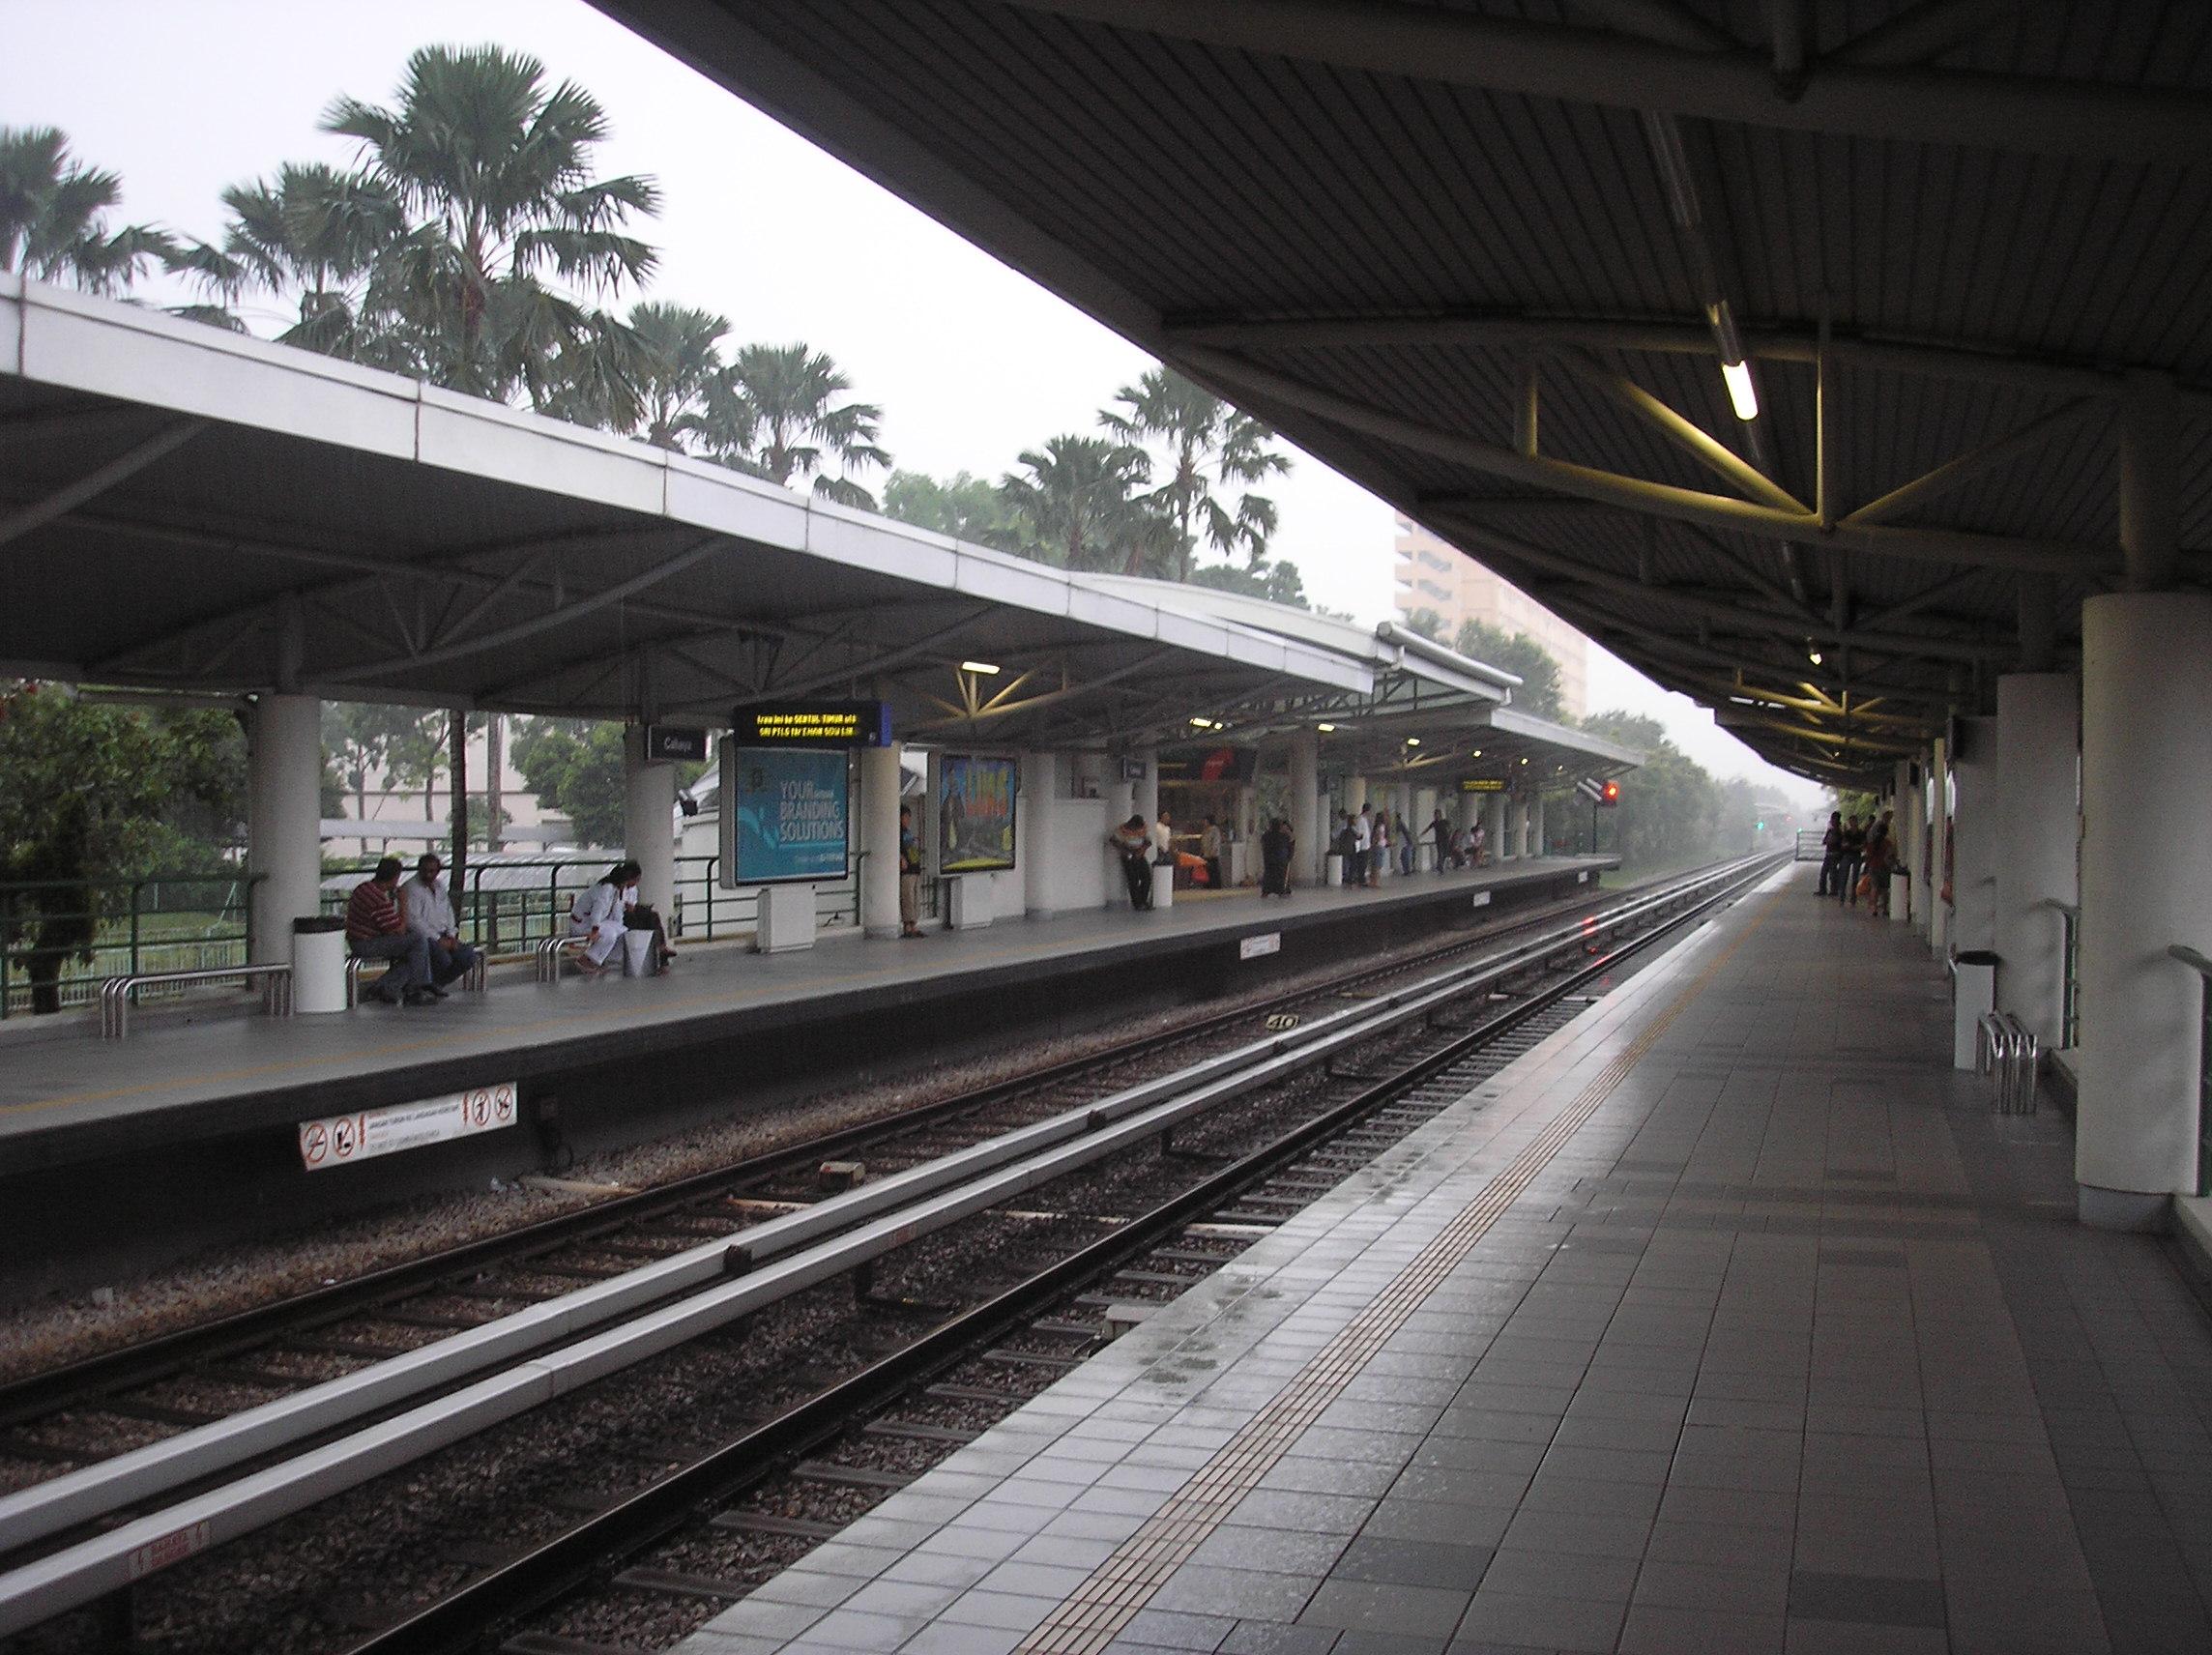 File:Cahaya station (Ampang Line), Selangor.JPG - Wikipedia, the ...